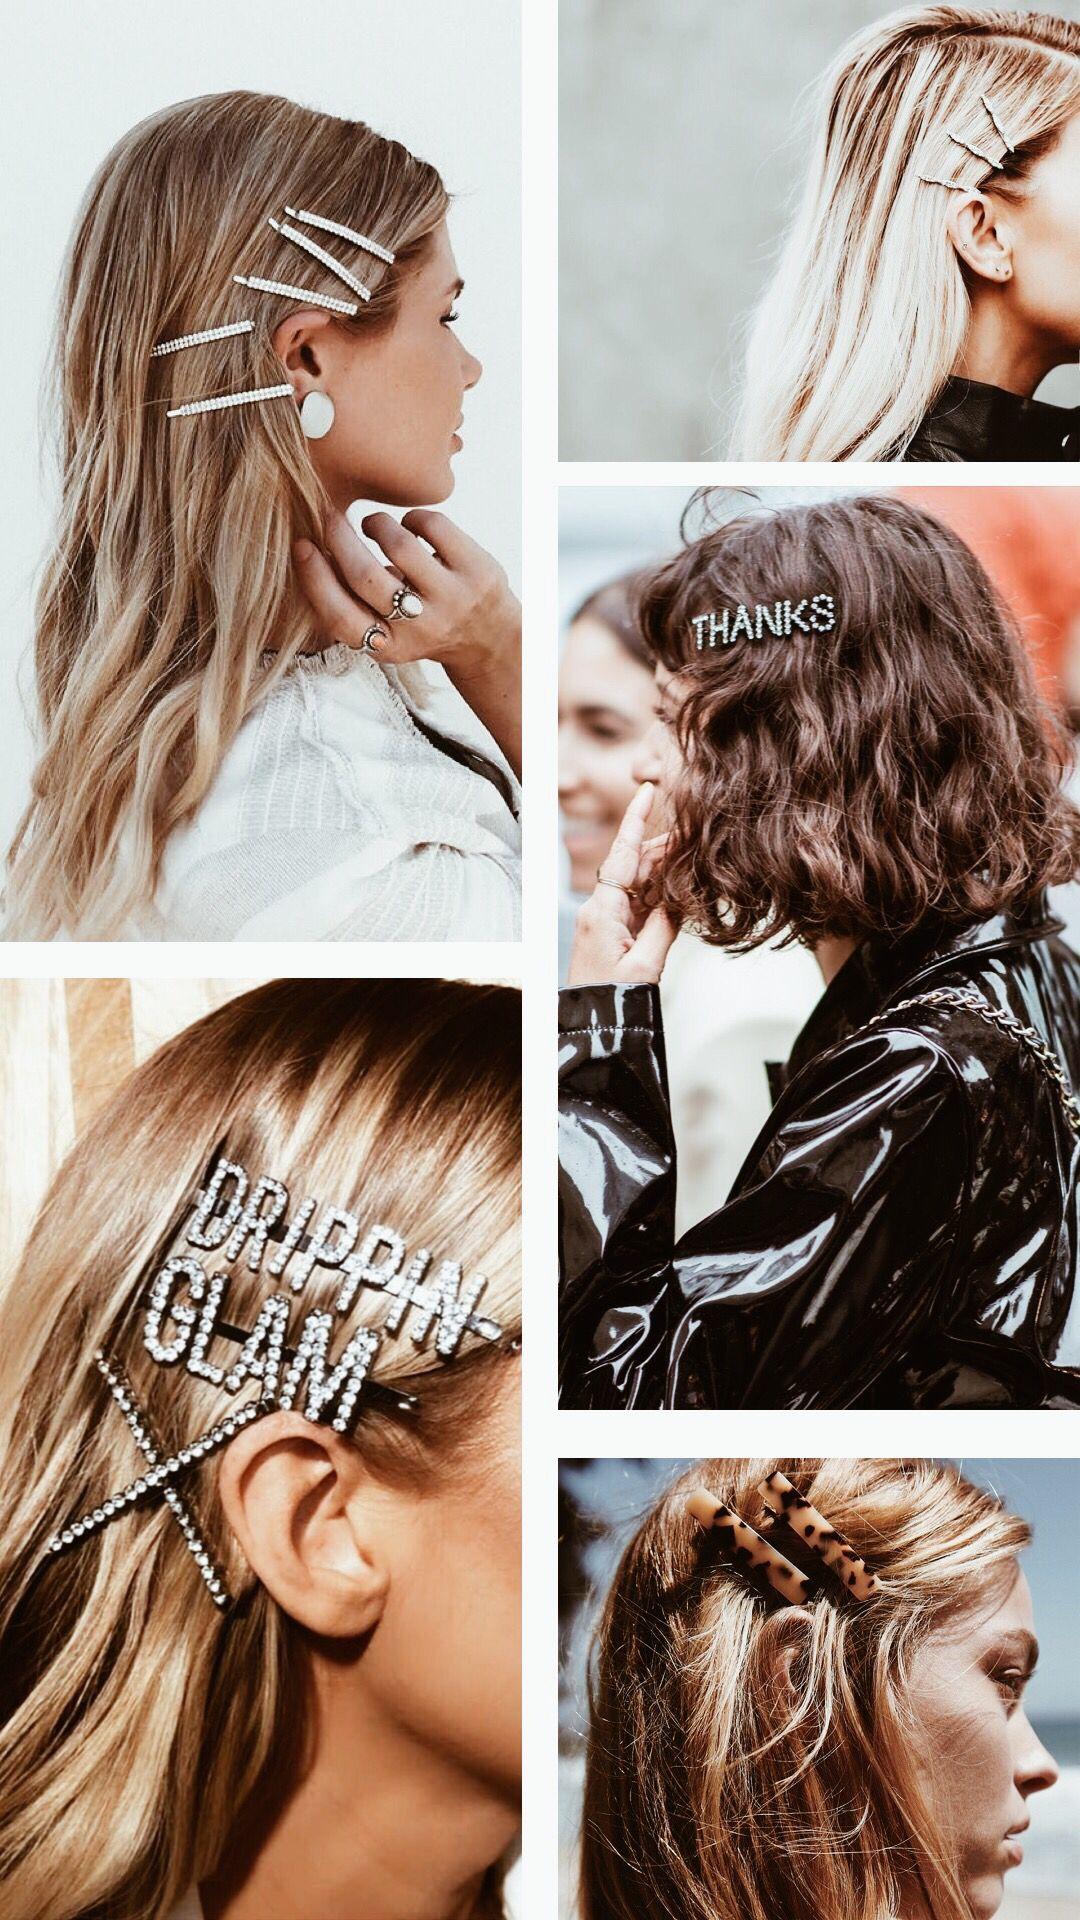 #hair #hairstyle #pearlhairclip